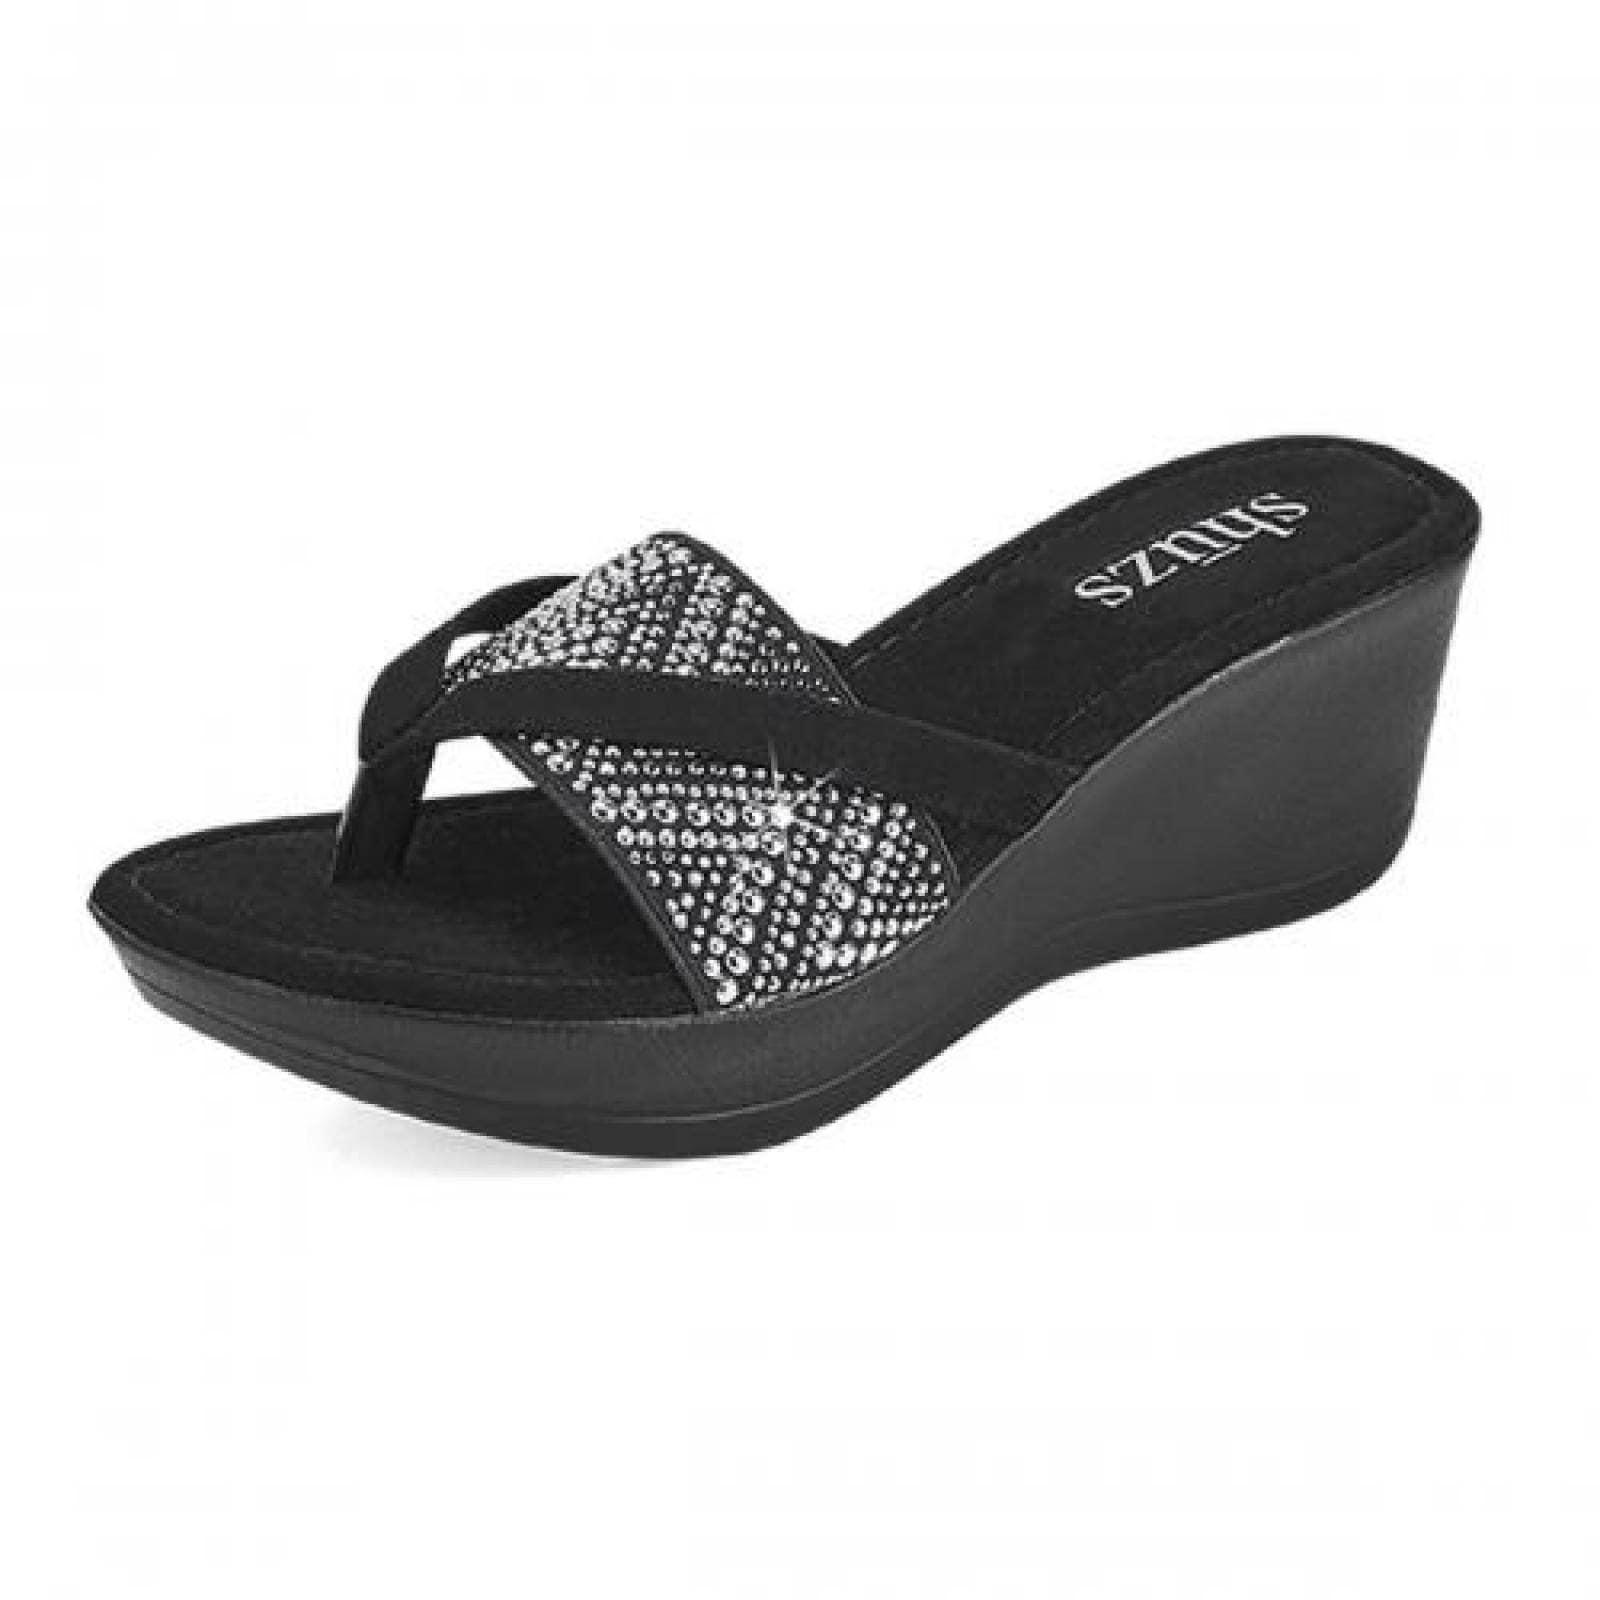 Sandalia para Mujer Shuzs P2404 054929 Color Negro